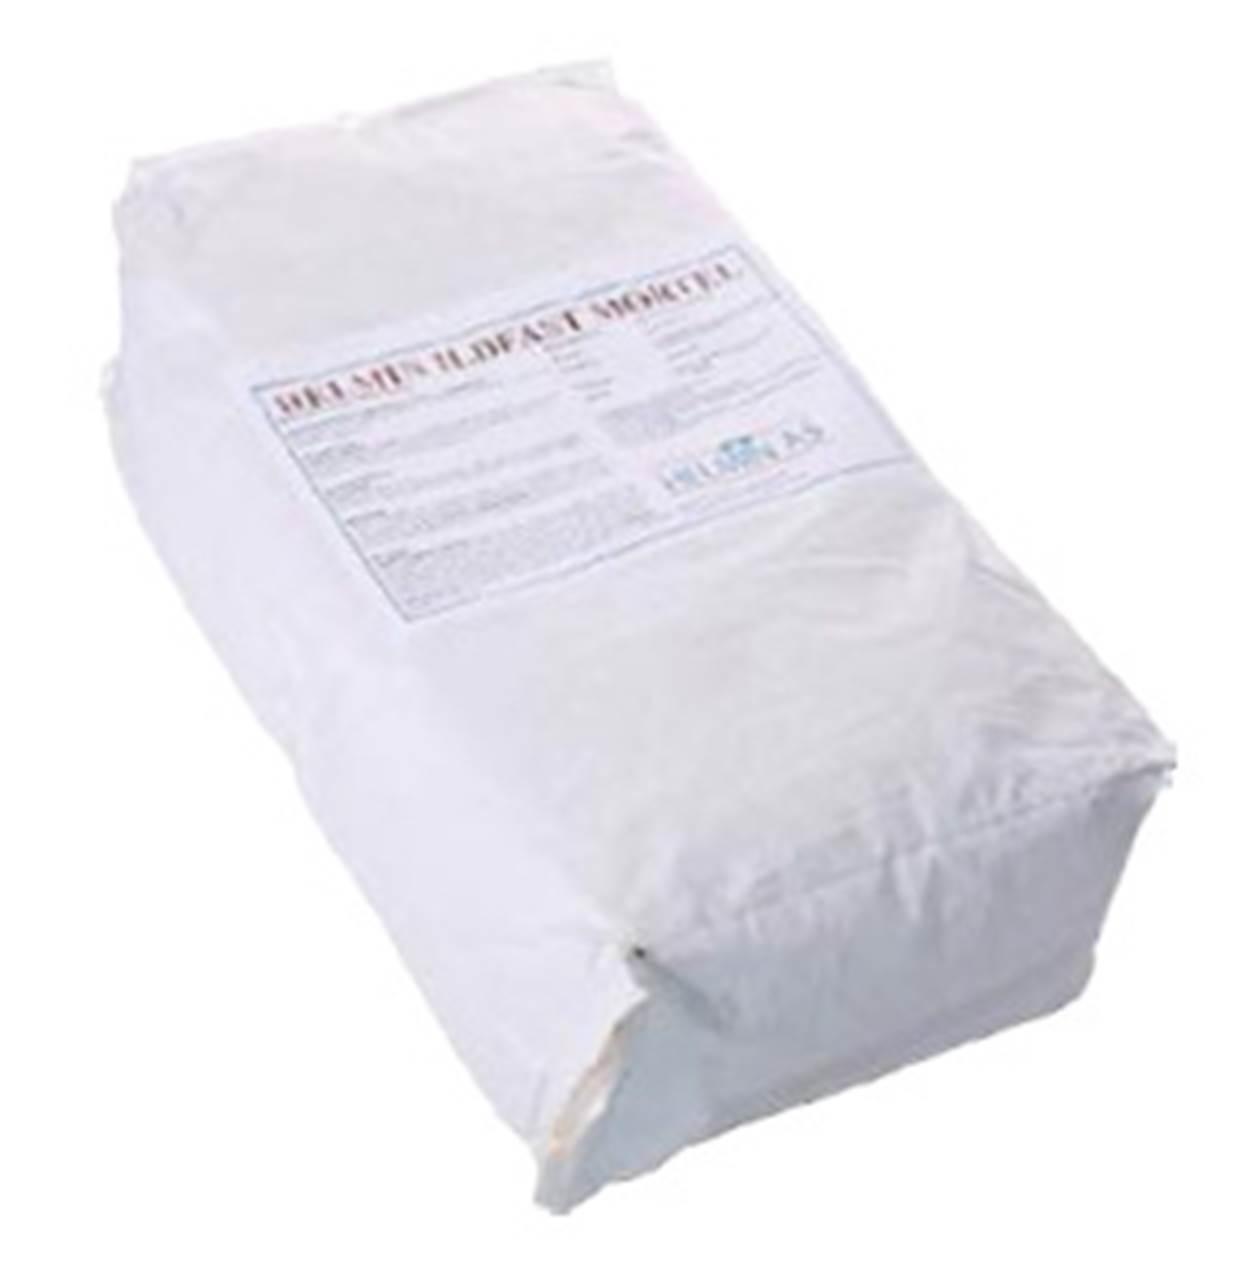 ILDFAST TØRR-MØRTELL 20kg AlfaOmega